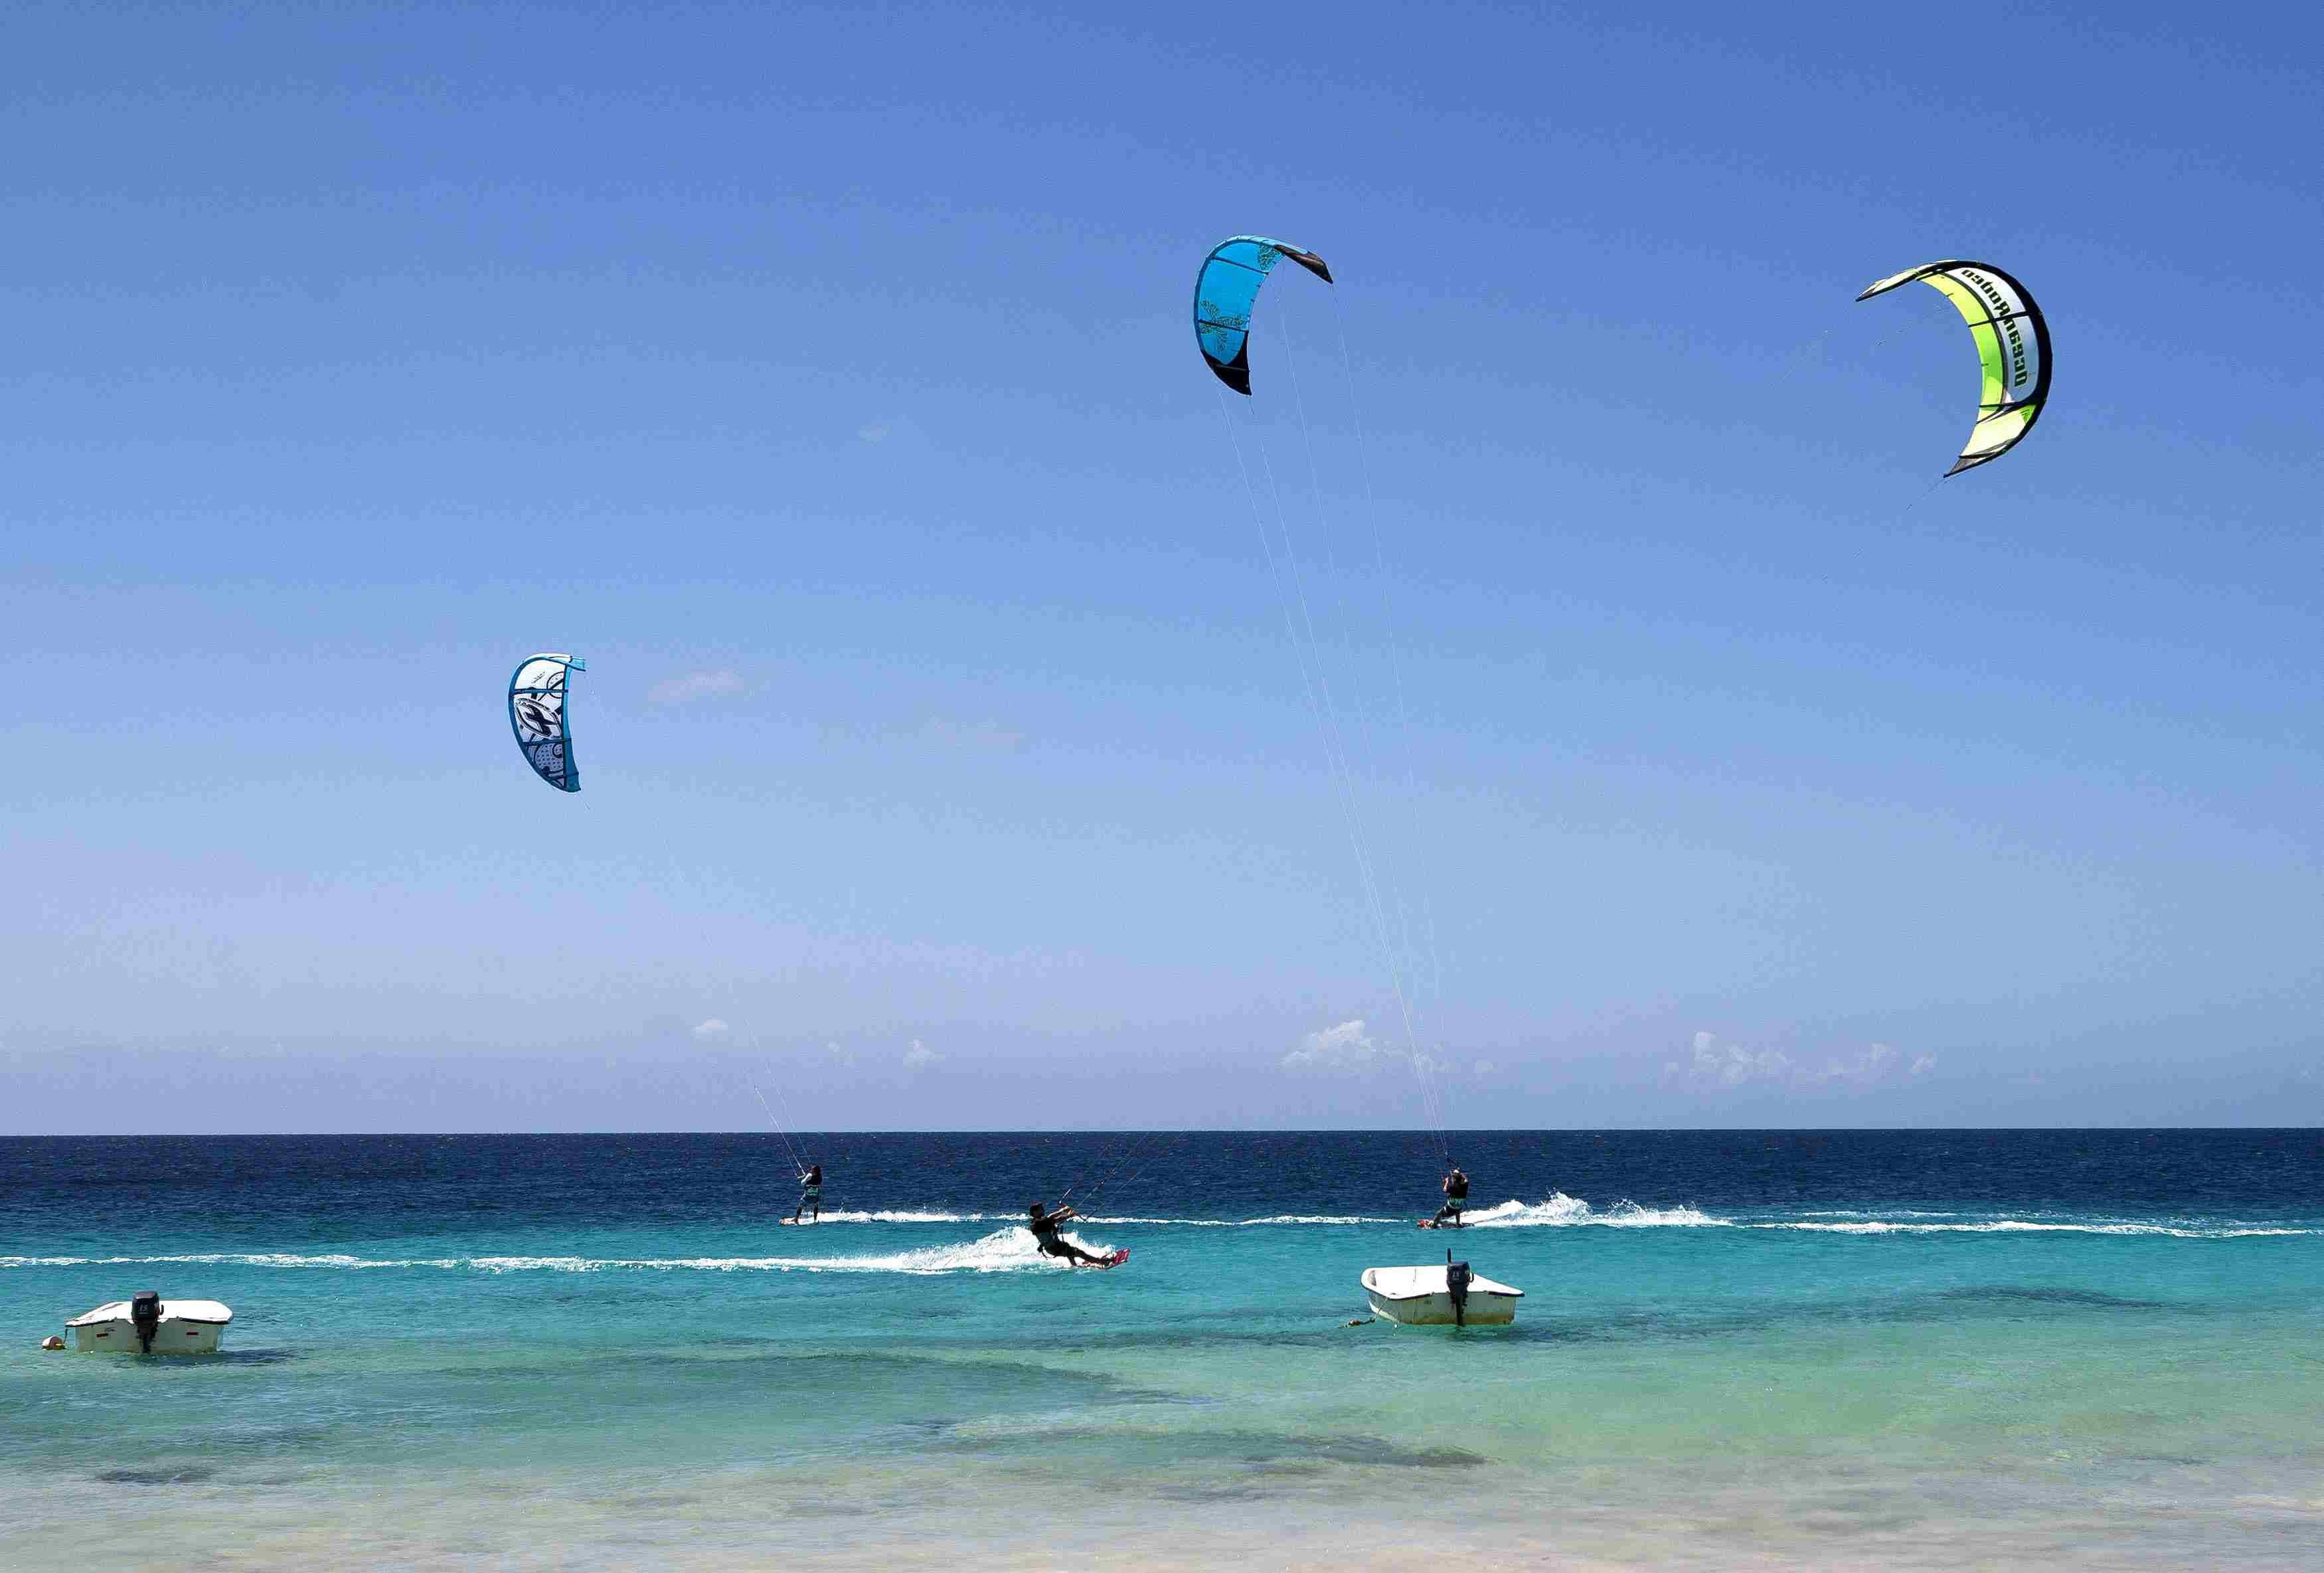 Kitesurfers and sailers in Bonaire